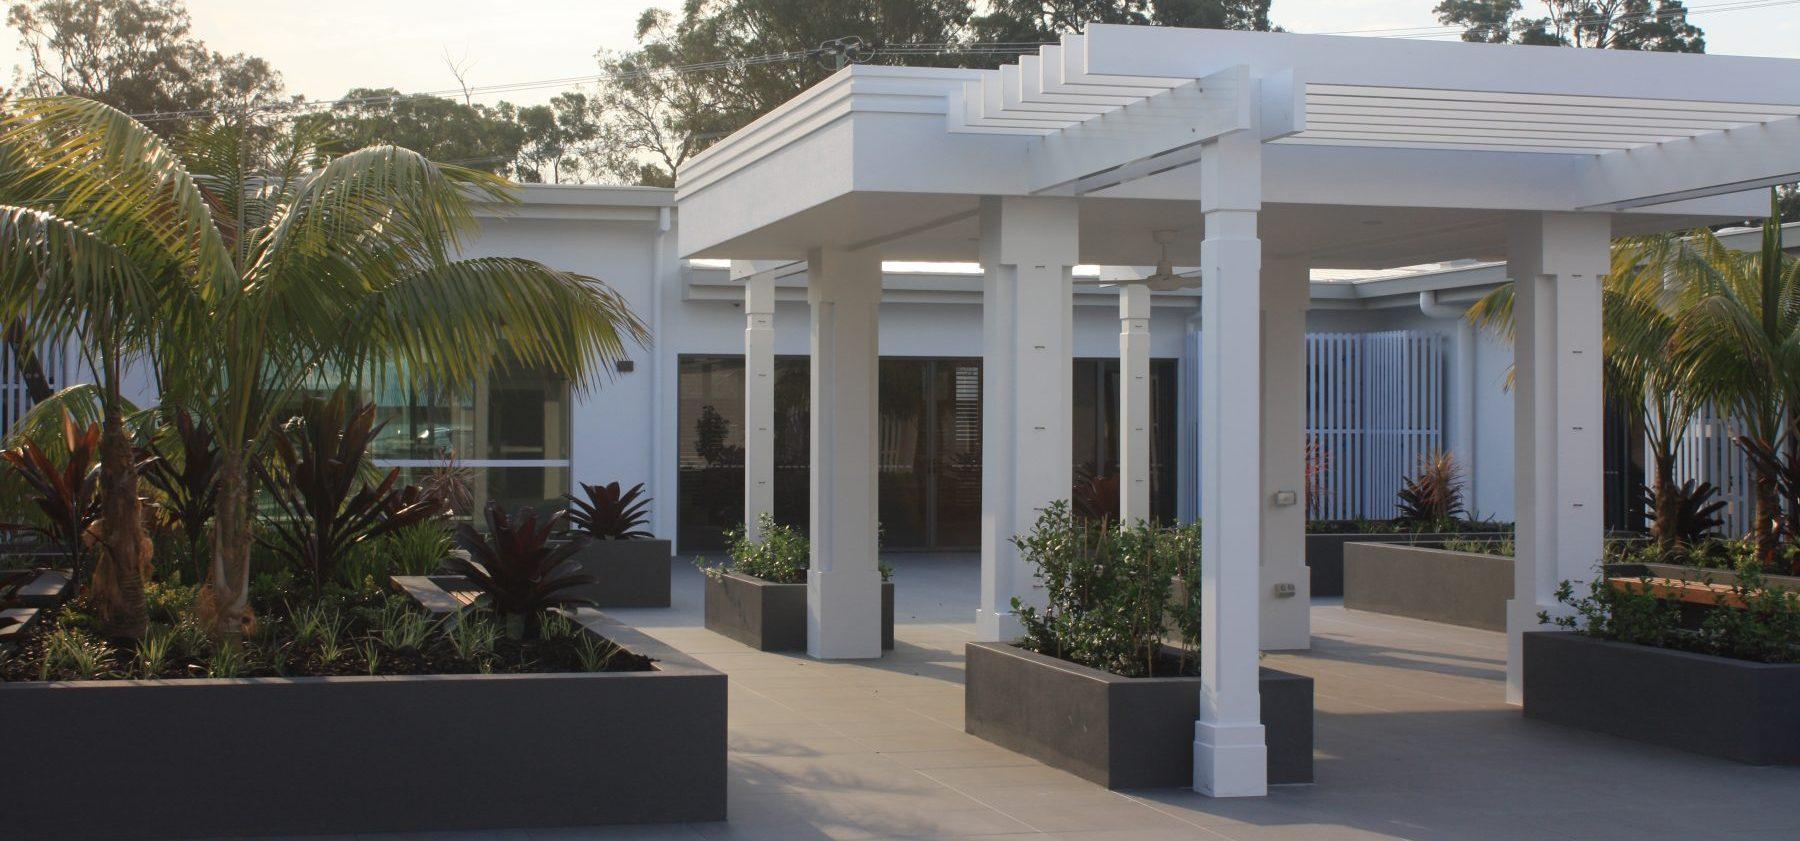 Arcare Parkwood External